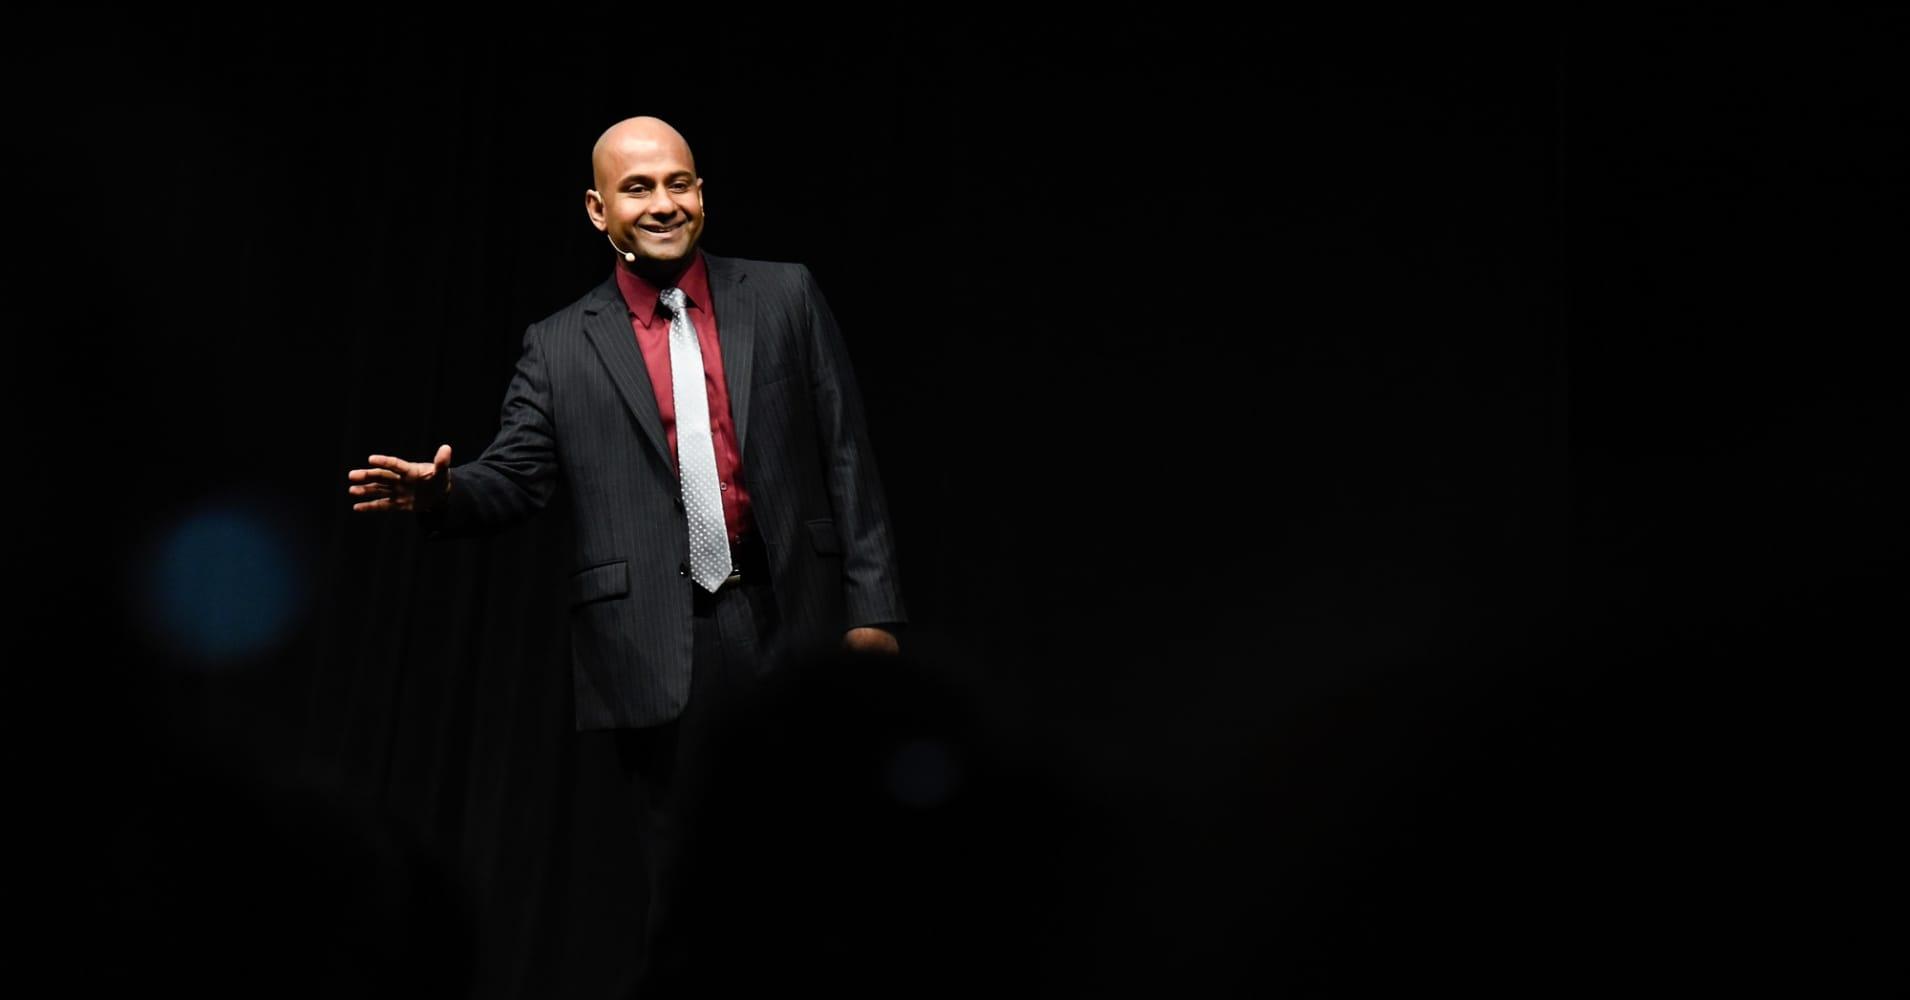 Manoj Vasudevan is the 2017 Toastmasters World Champion of Public Speaking.